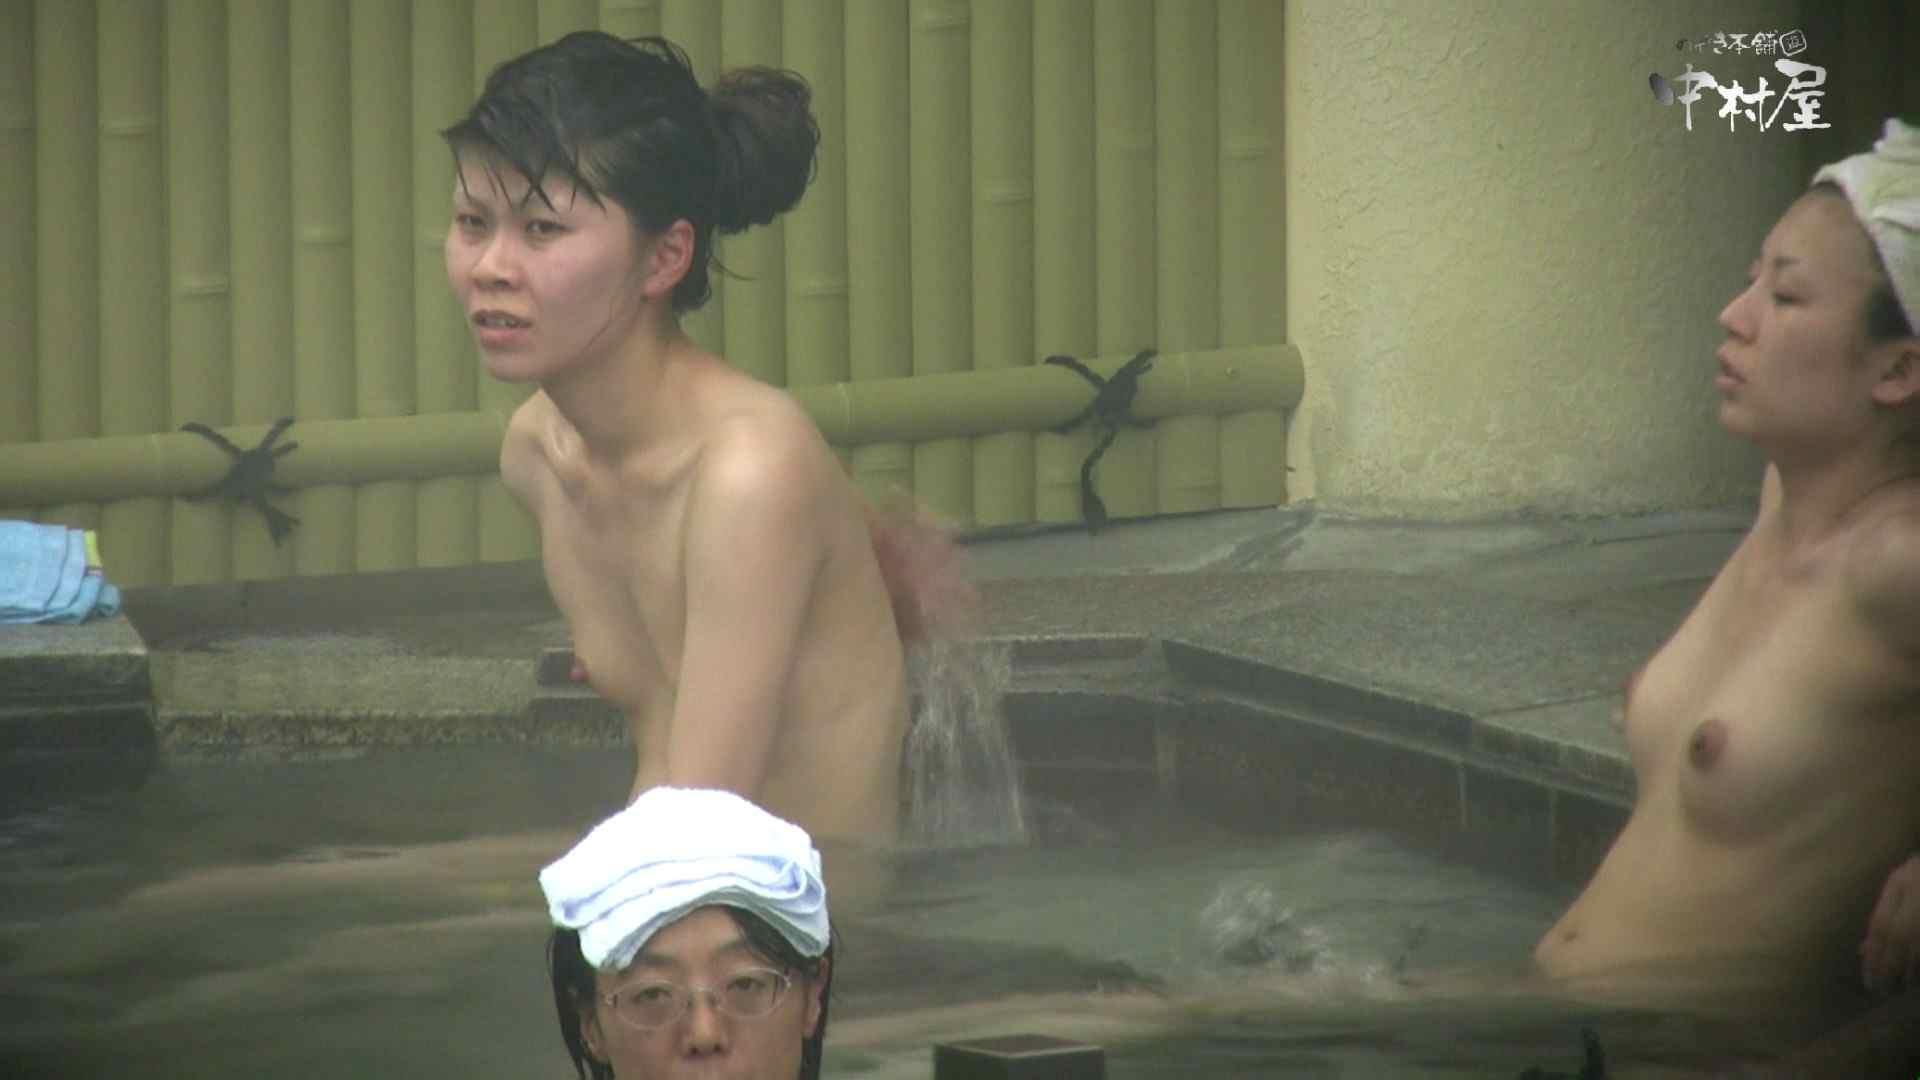 Aquaな露天風呂Vol.890 盗撮シリーズ   露天風呂編  93PIX 47